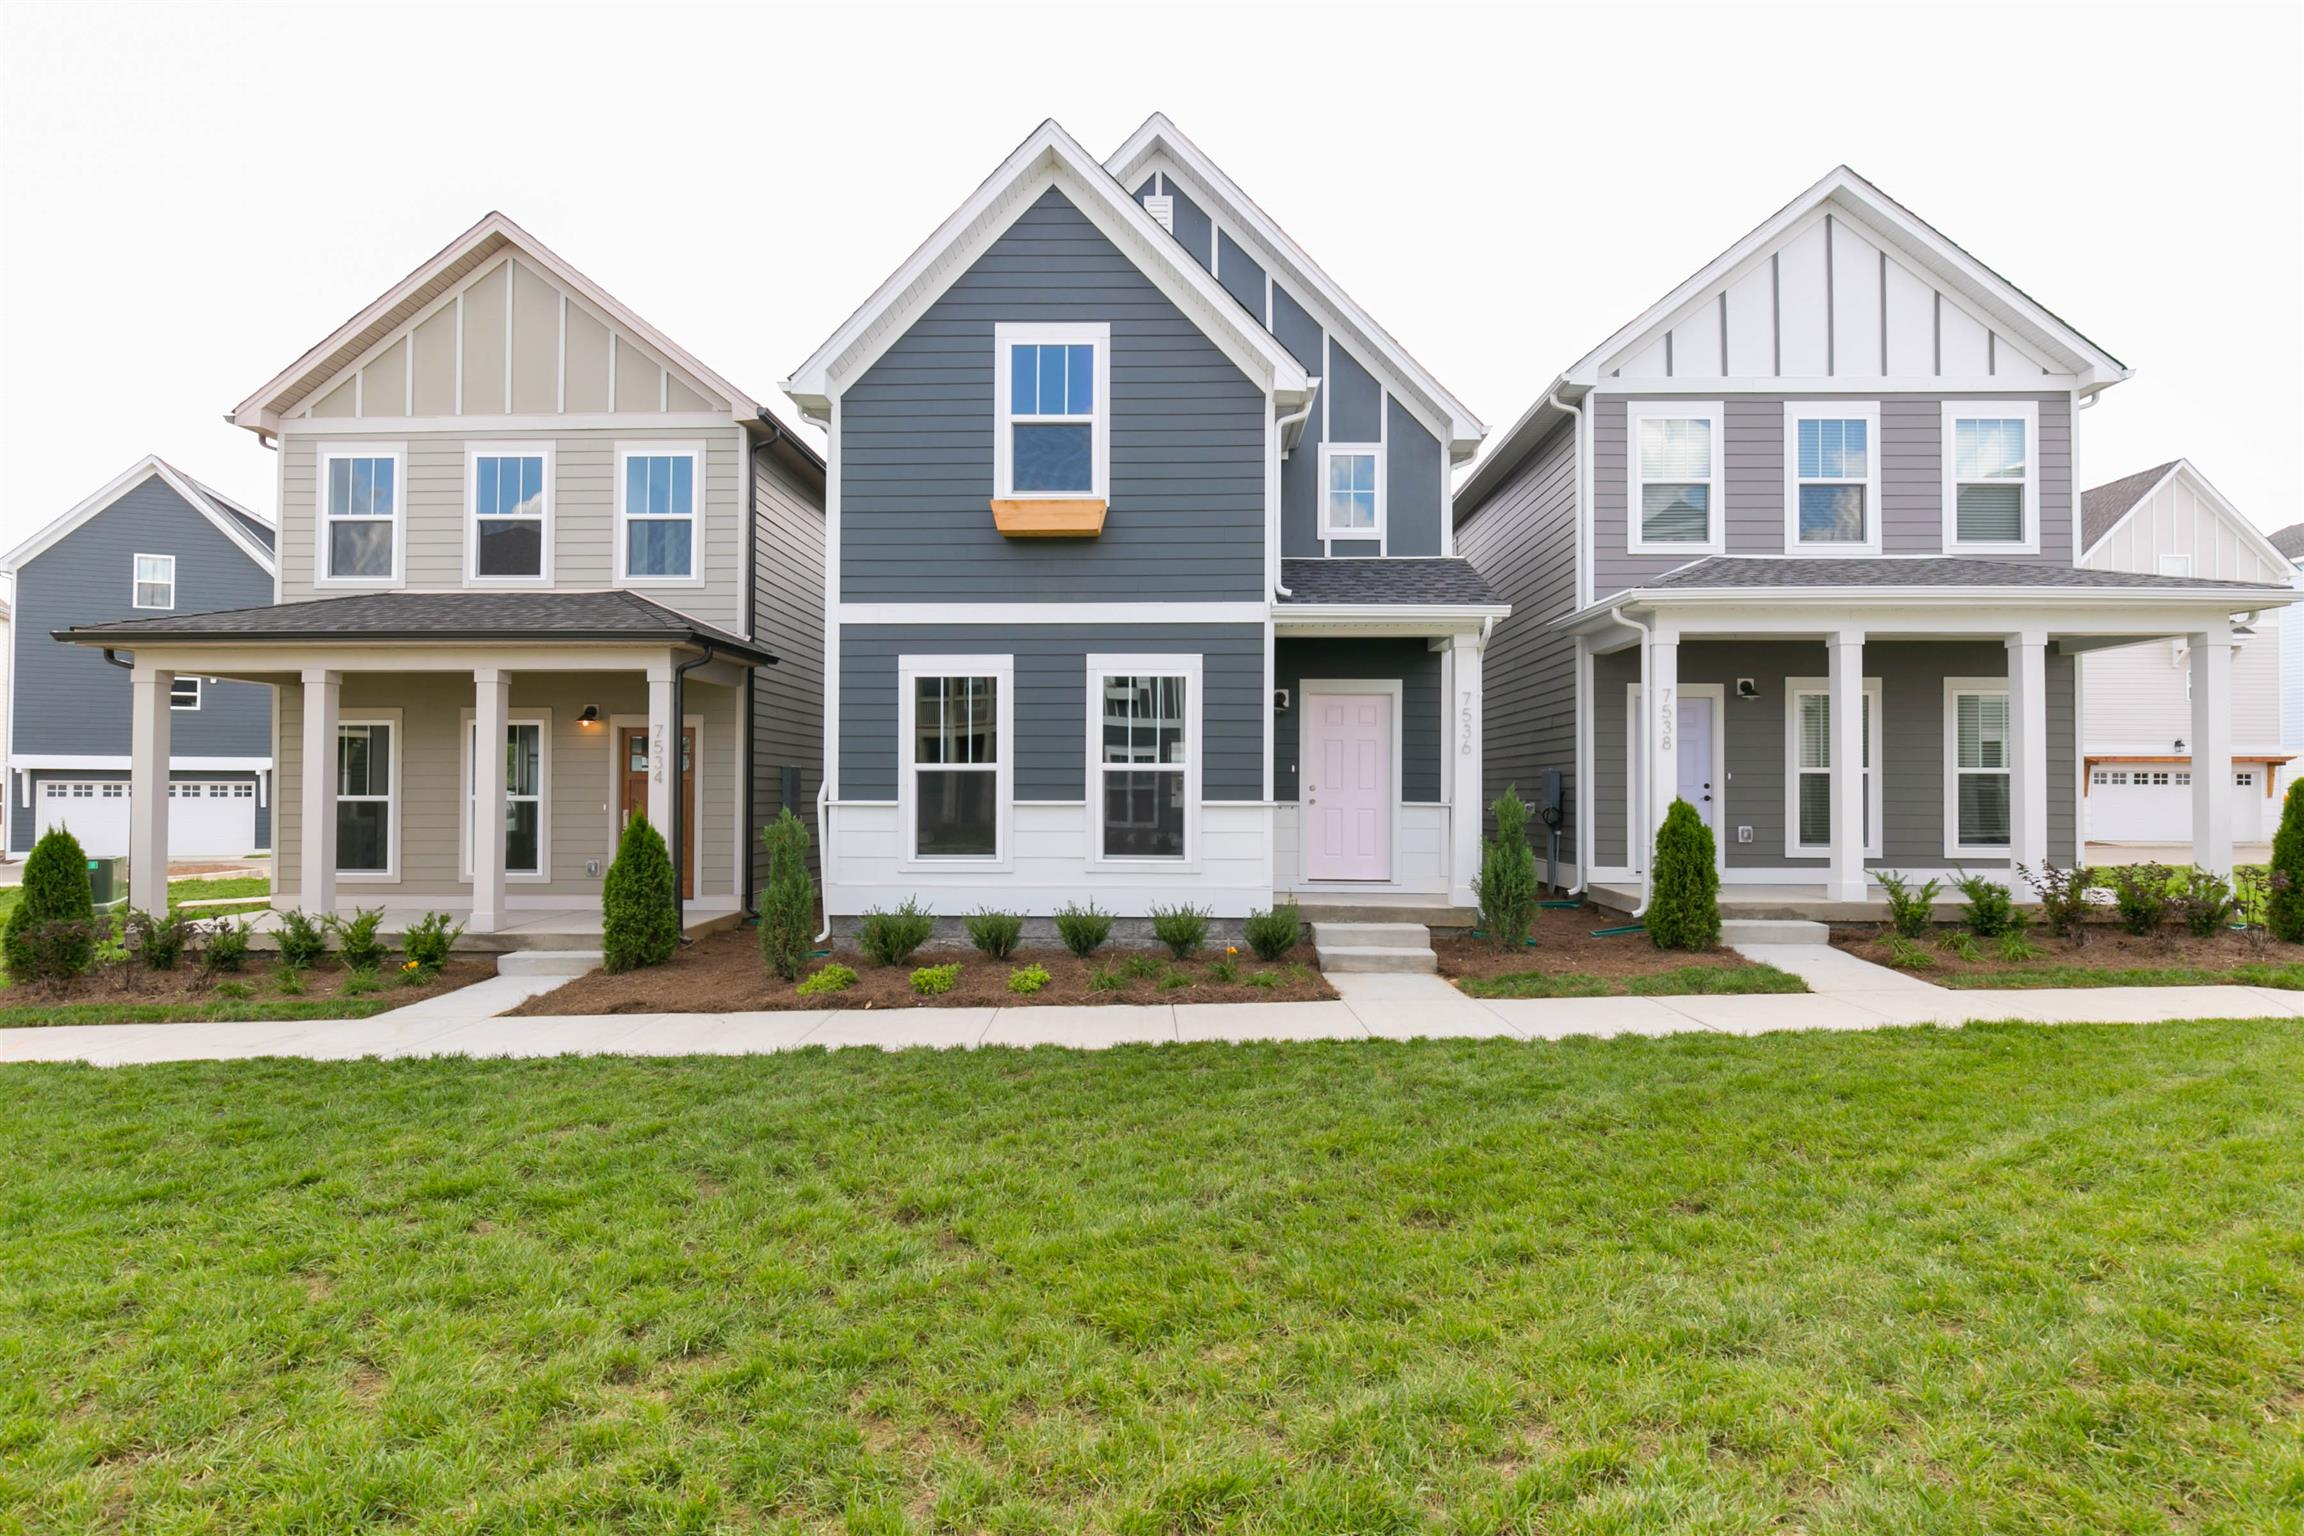 2602 Sonoma Way, Columbia, TN 38401 - Columbia, TN real estate listing